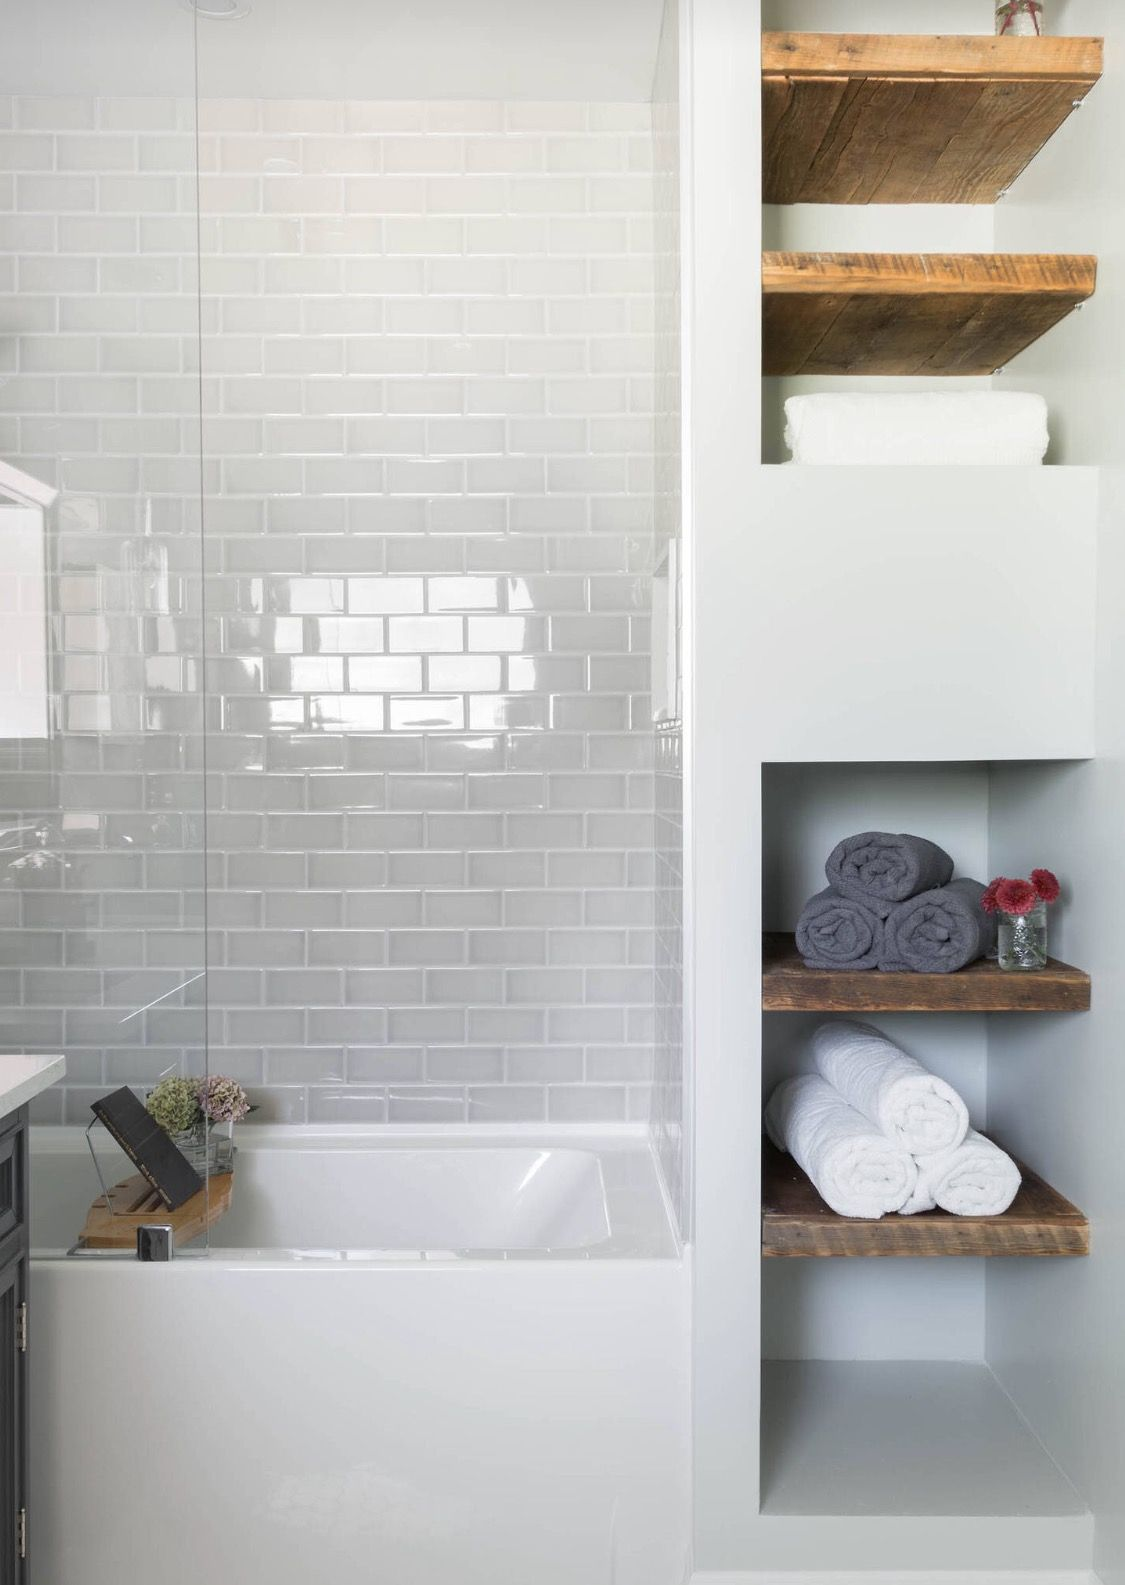 Put washer n dryer where shelves are, small shower, toilet on left ...